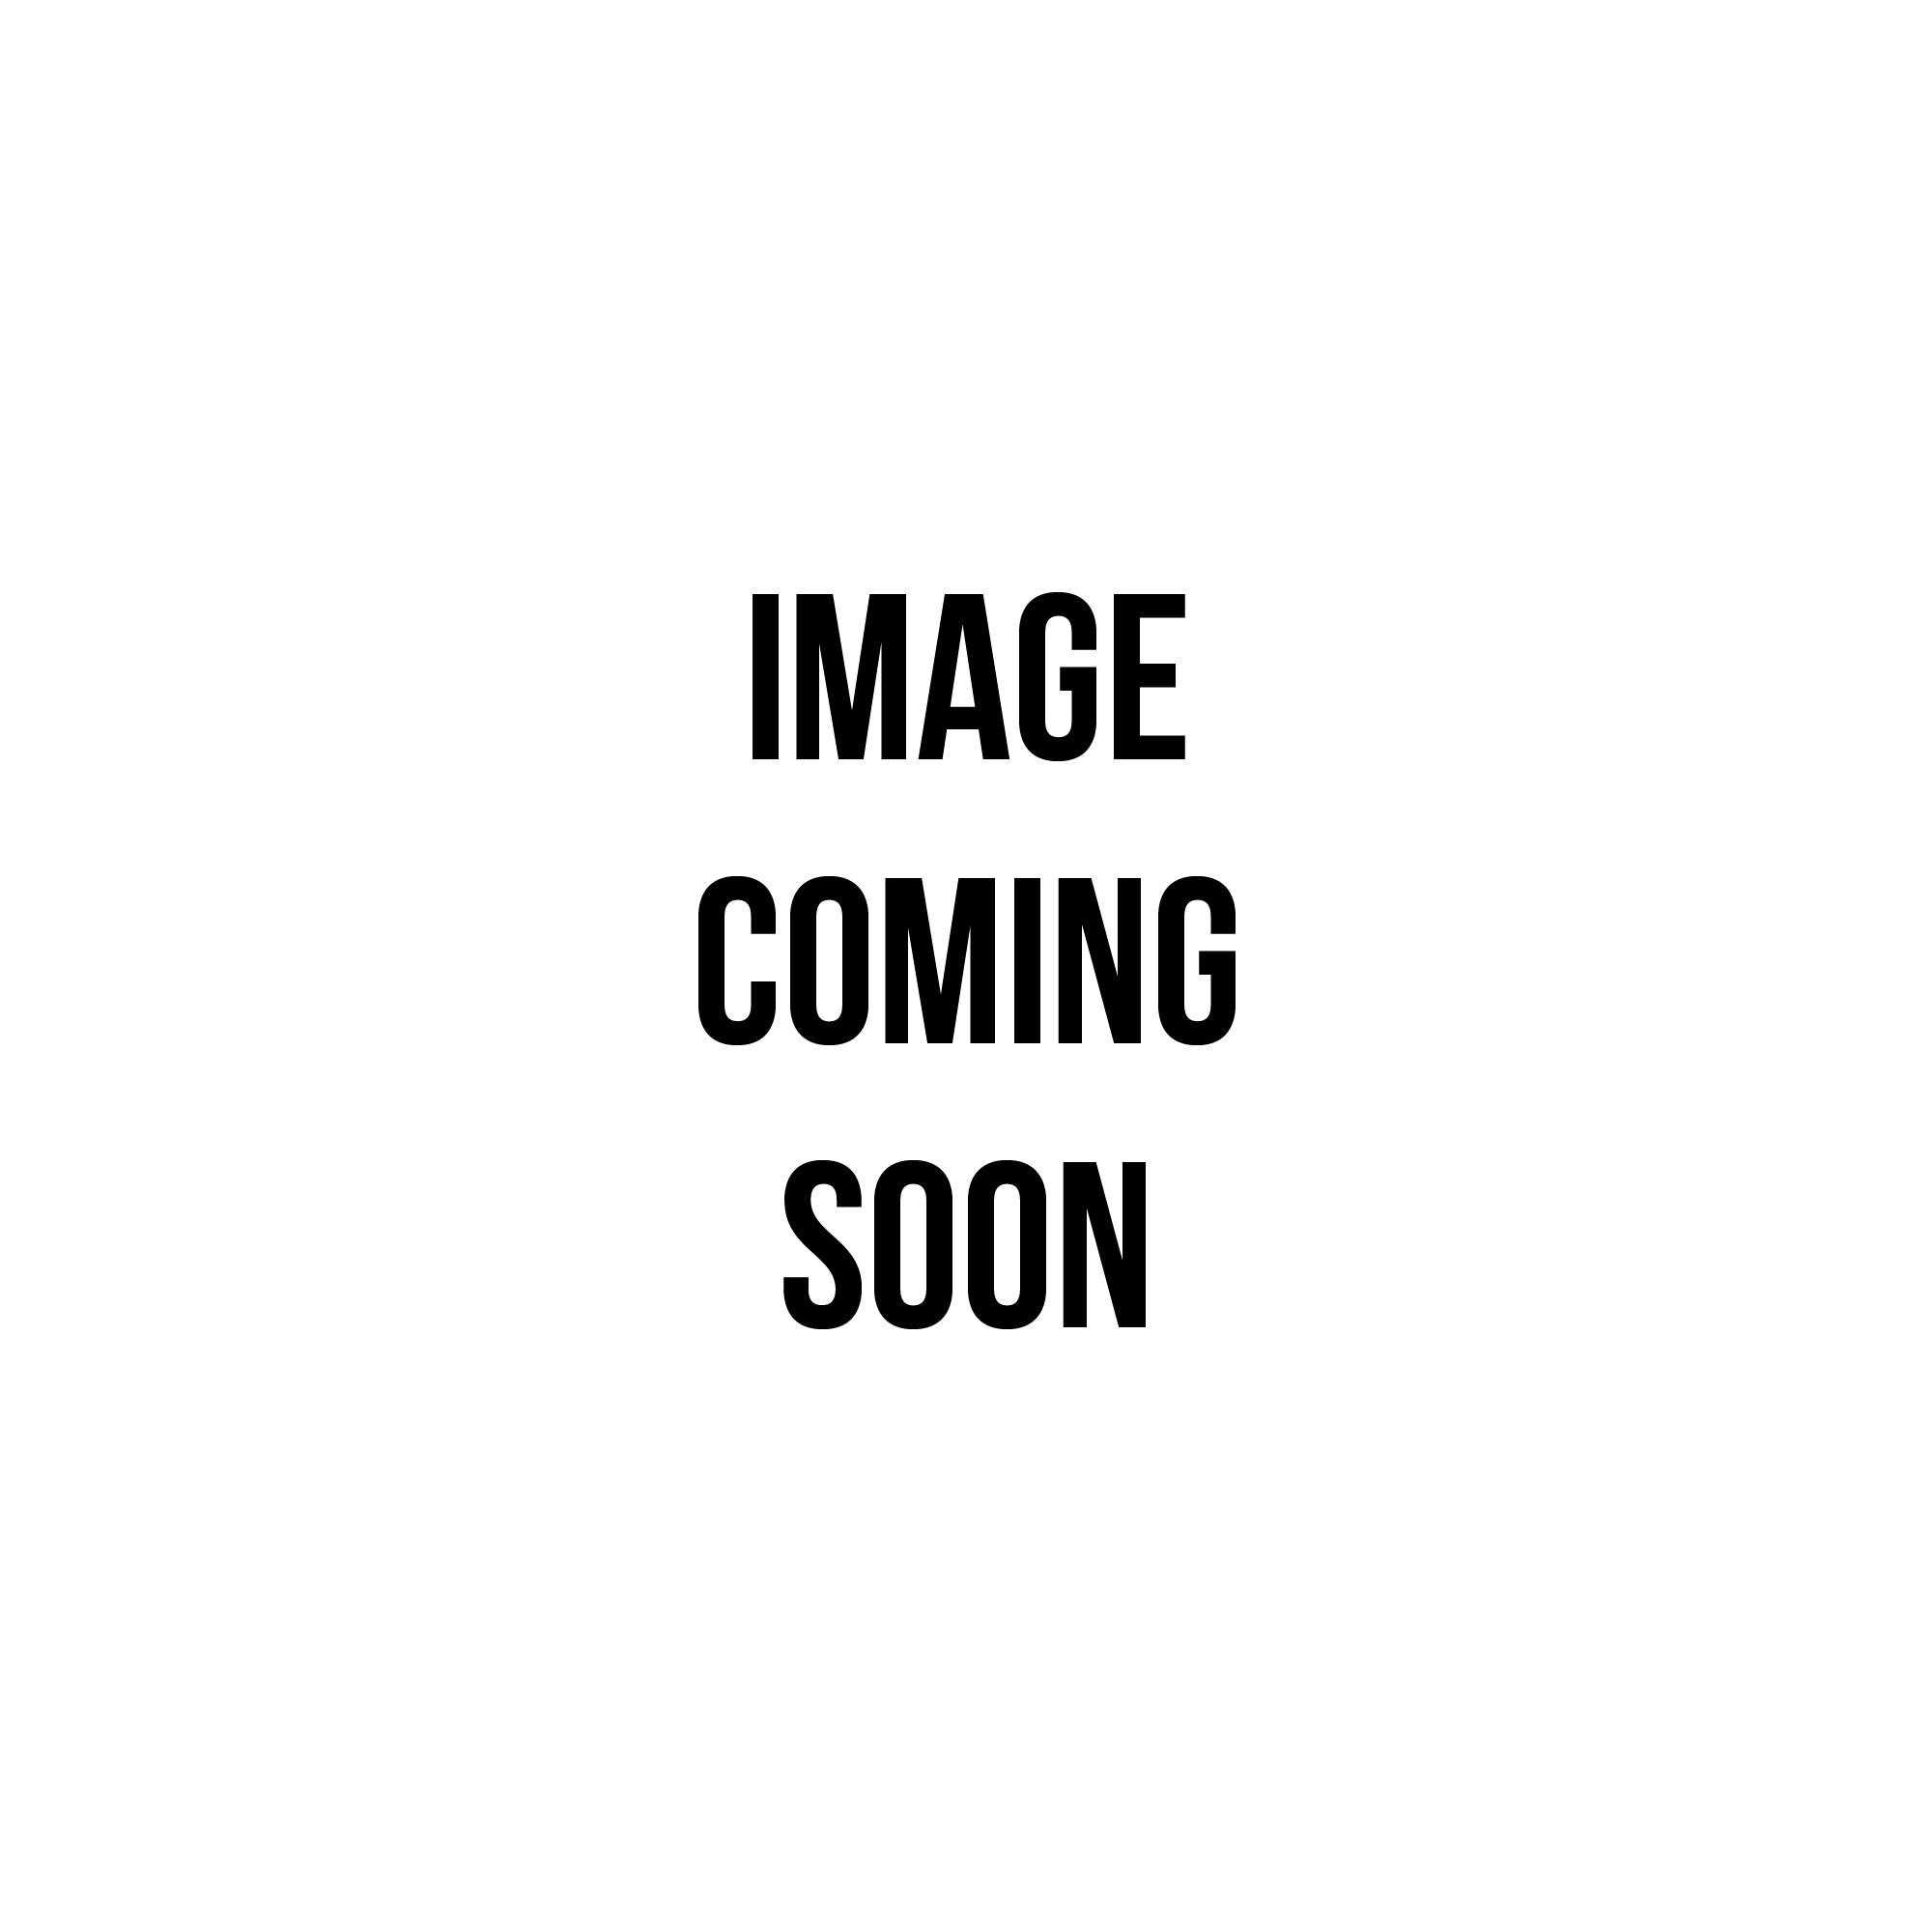 Nike Air Max Tn Zapatos Para Hombre Blanco Grisáceo 2029 Del Calendario